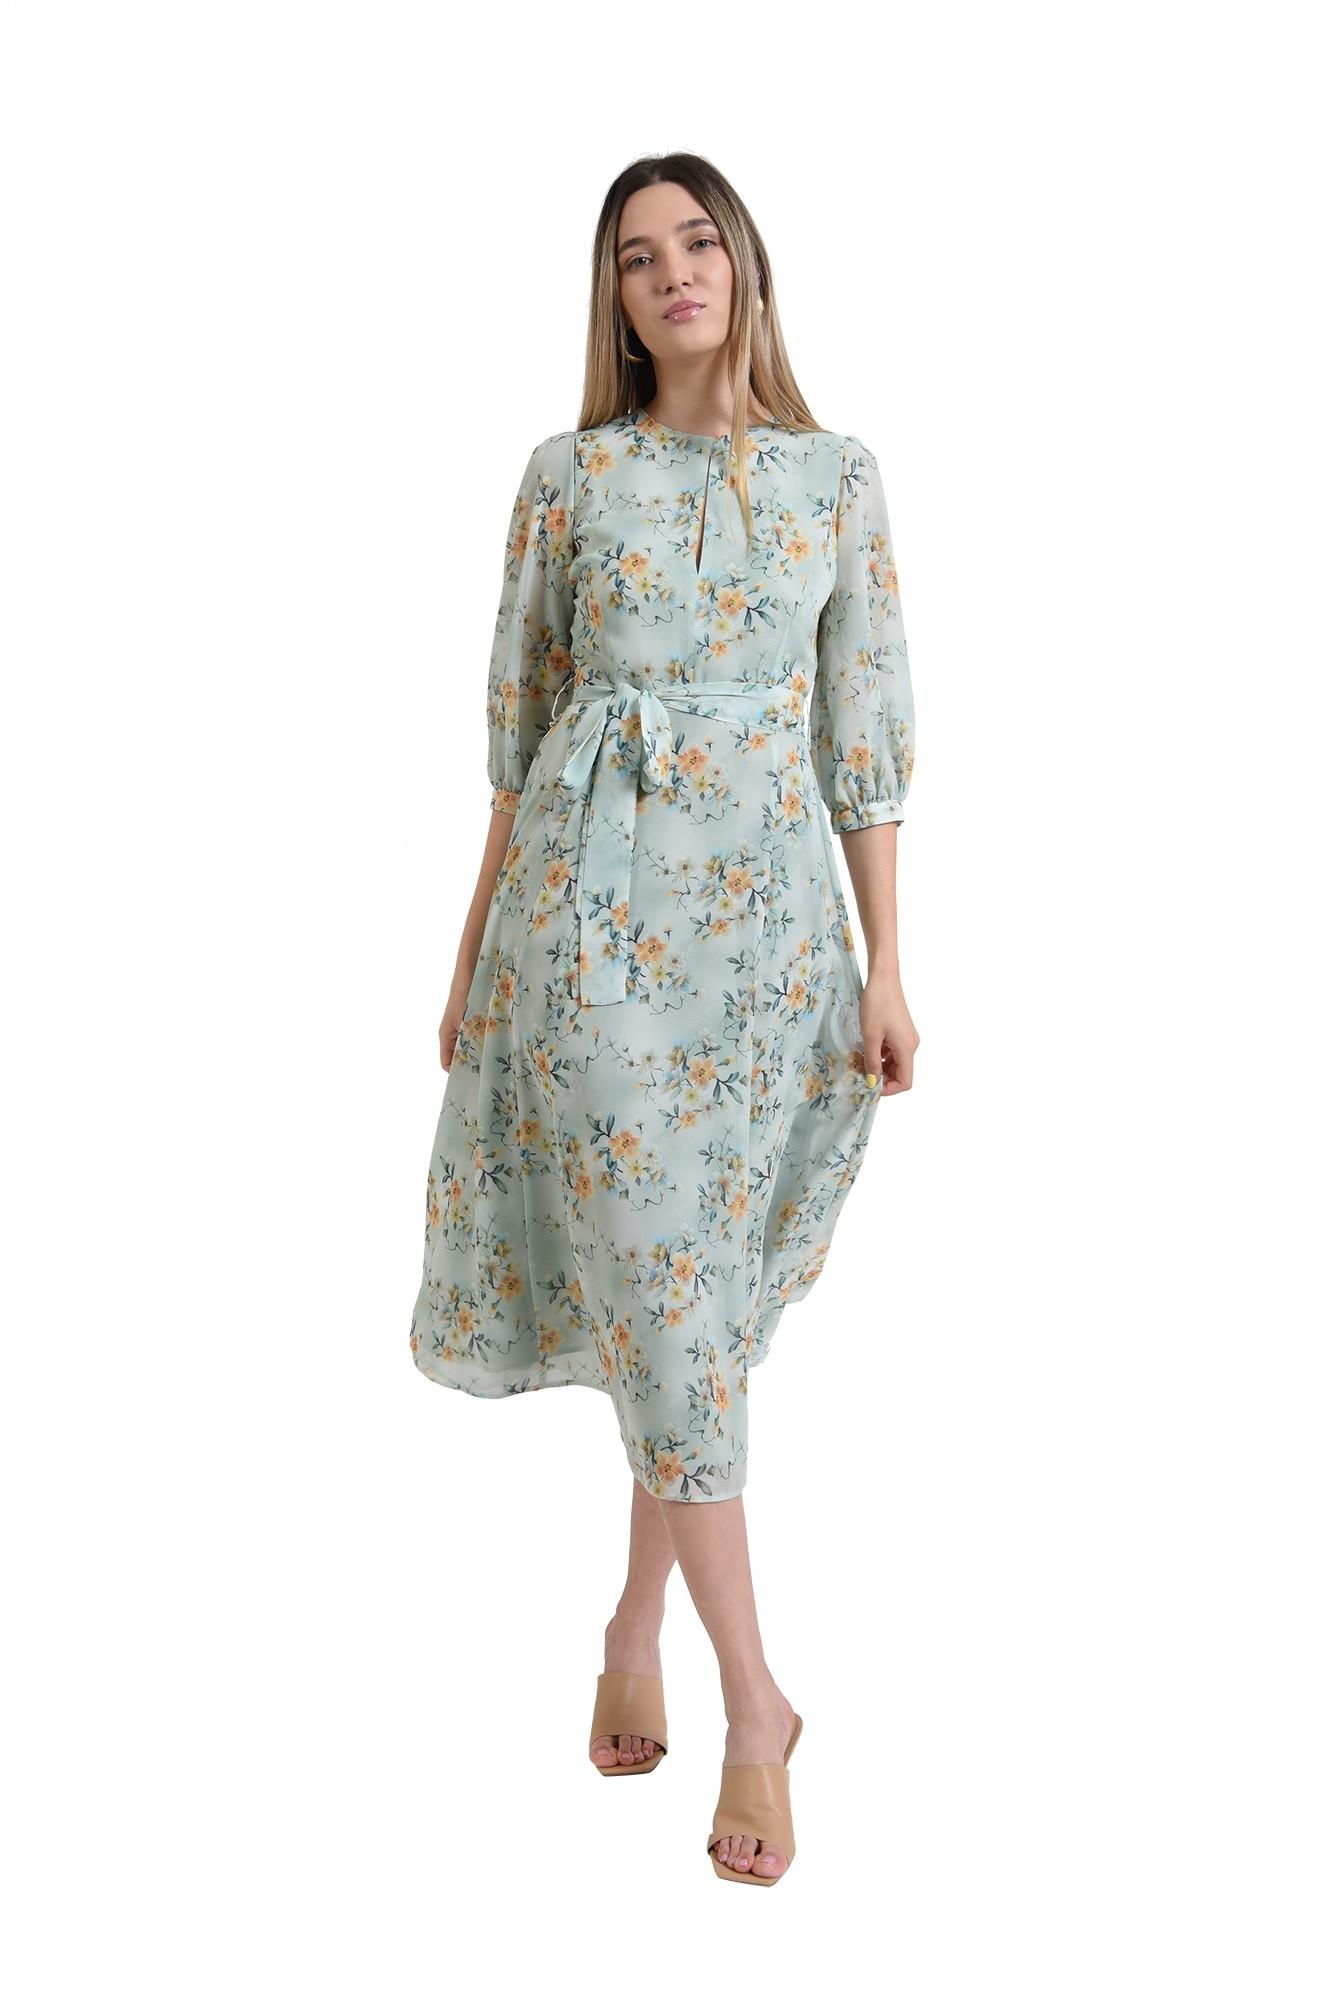 3 - rochie eleganta, verde, pastel, cu flori, poema, evazata